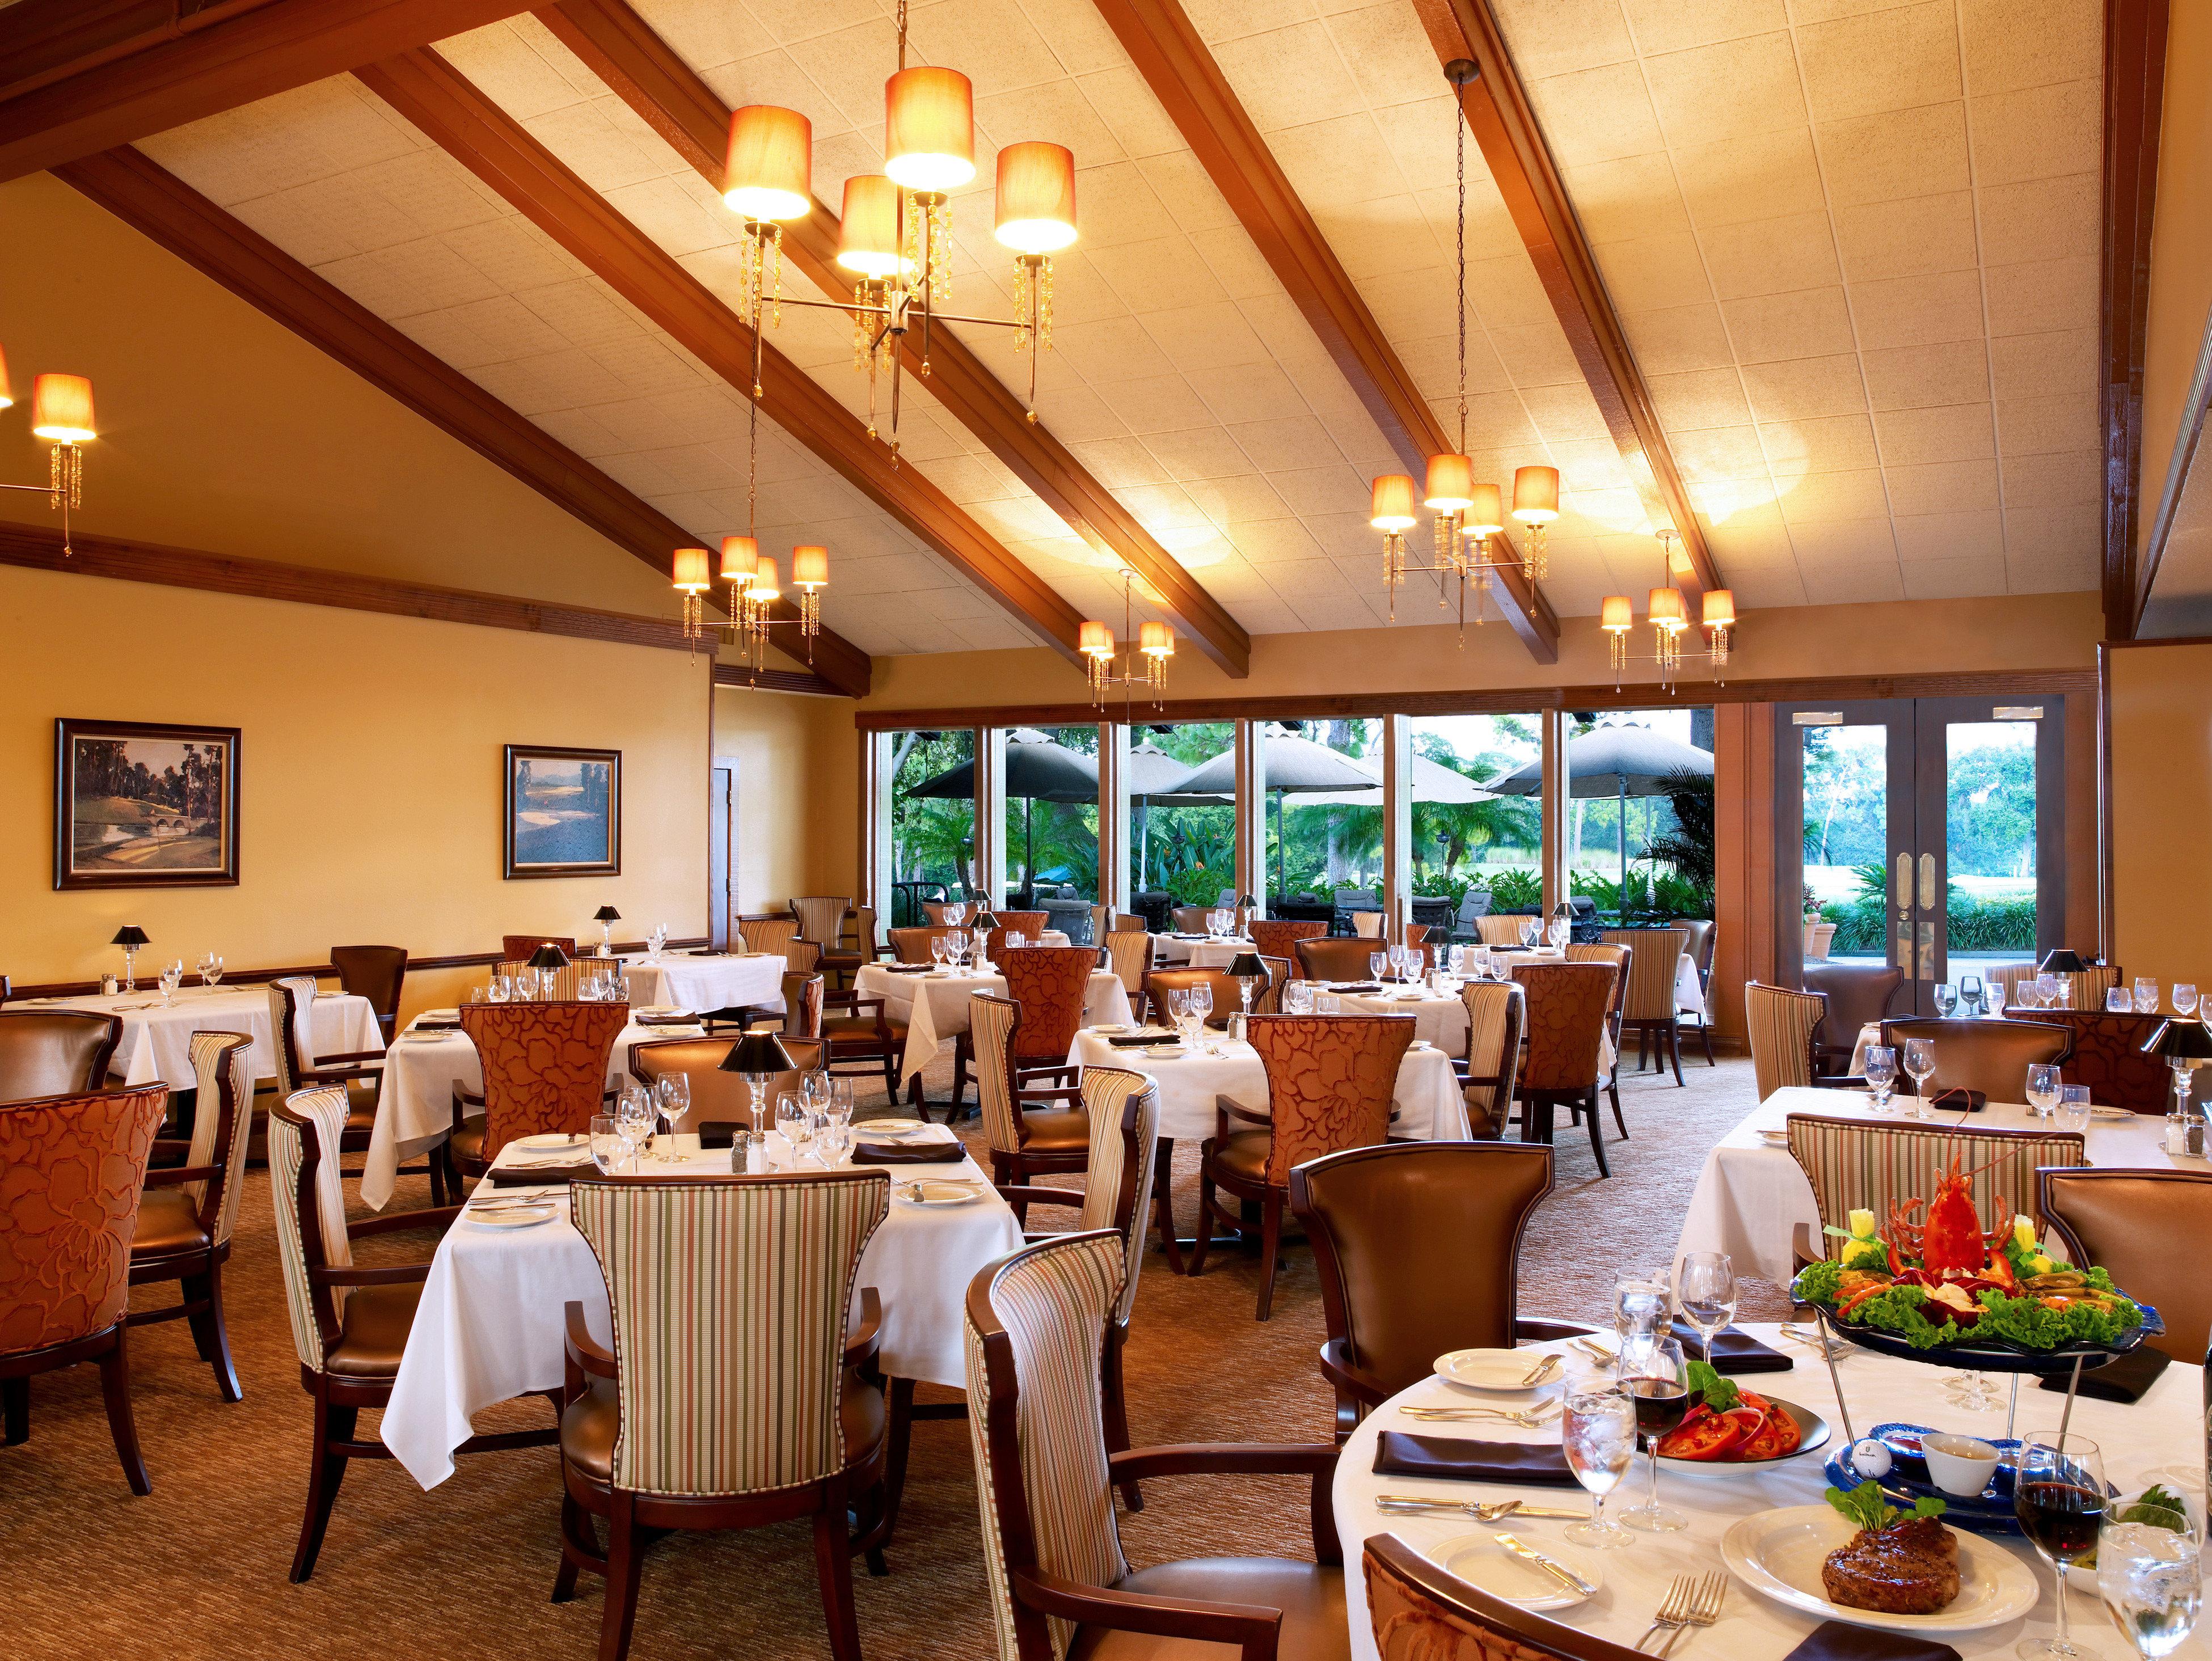 Bar Dining Drink Eat Elegant restaurant Resort function hall set